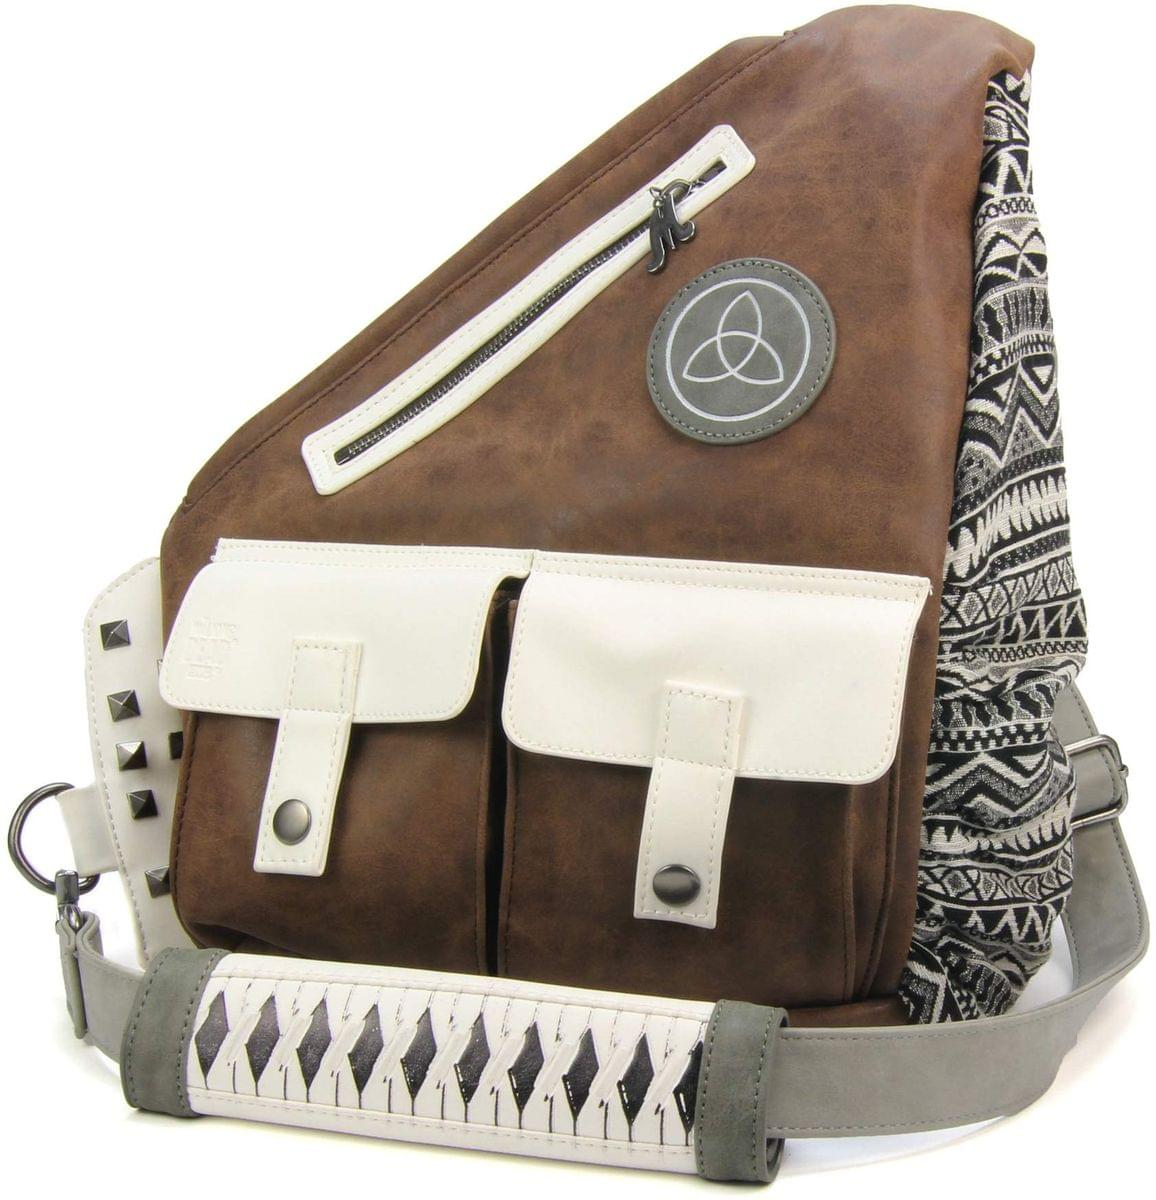 The Walking Dead Michonne Faux Leather Sling Bag